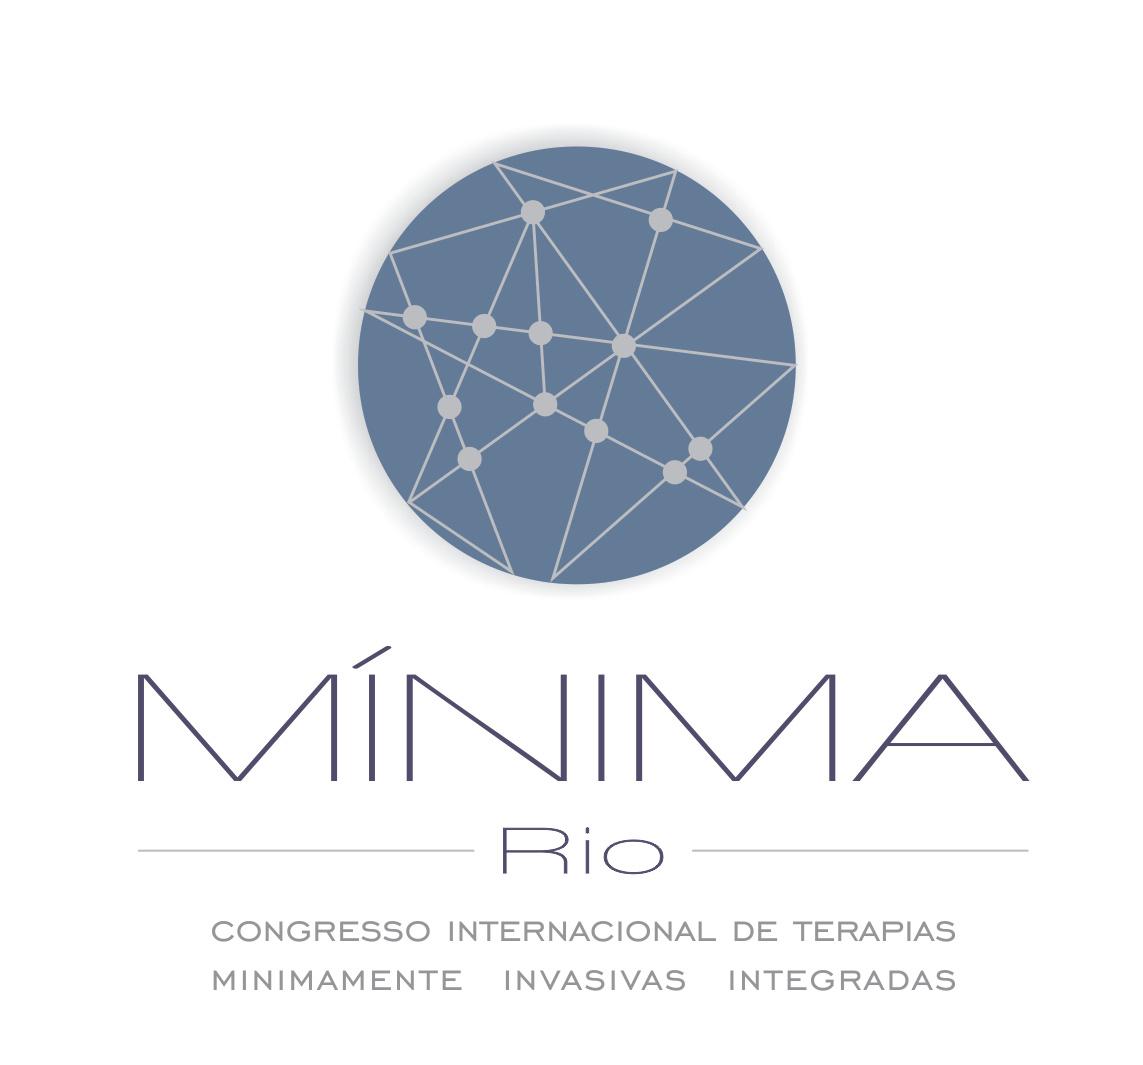 Logo Congresso Mínima Rio